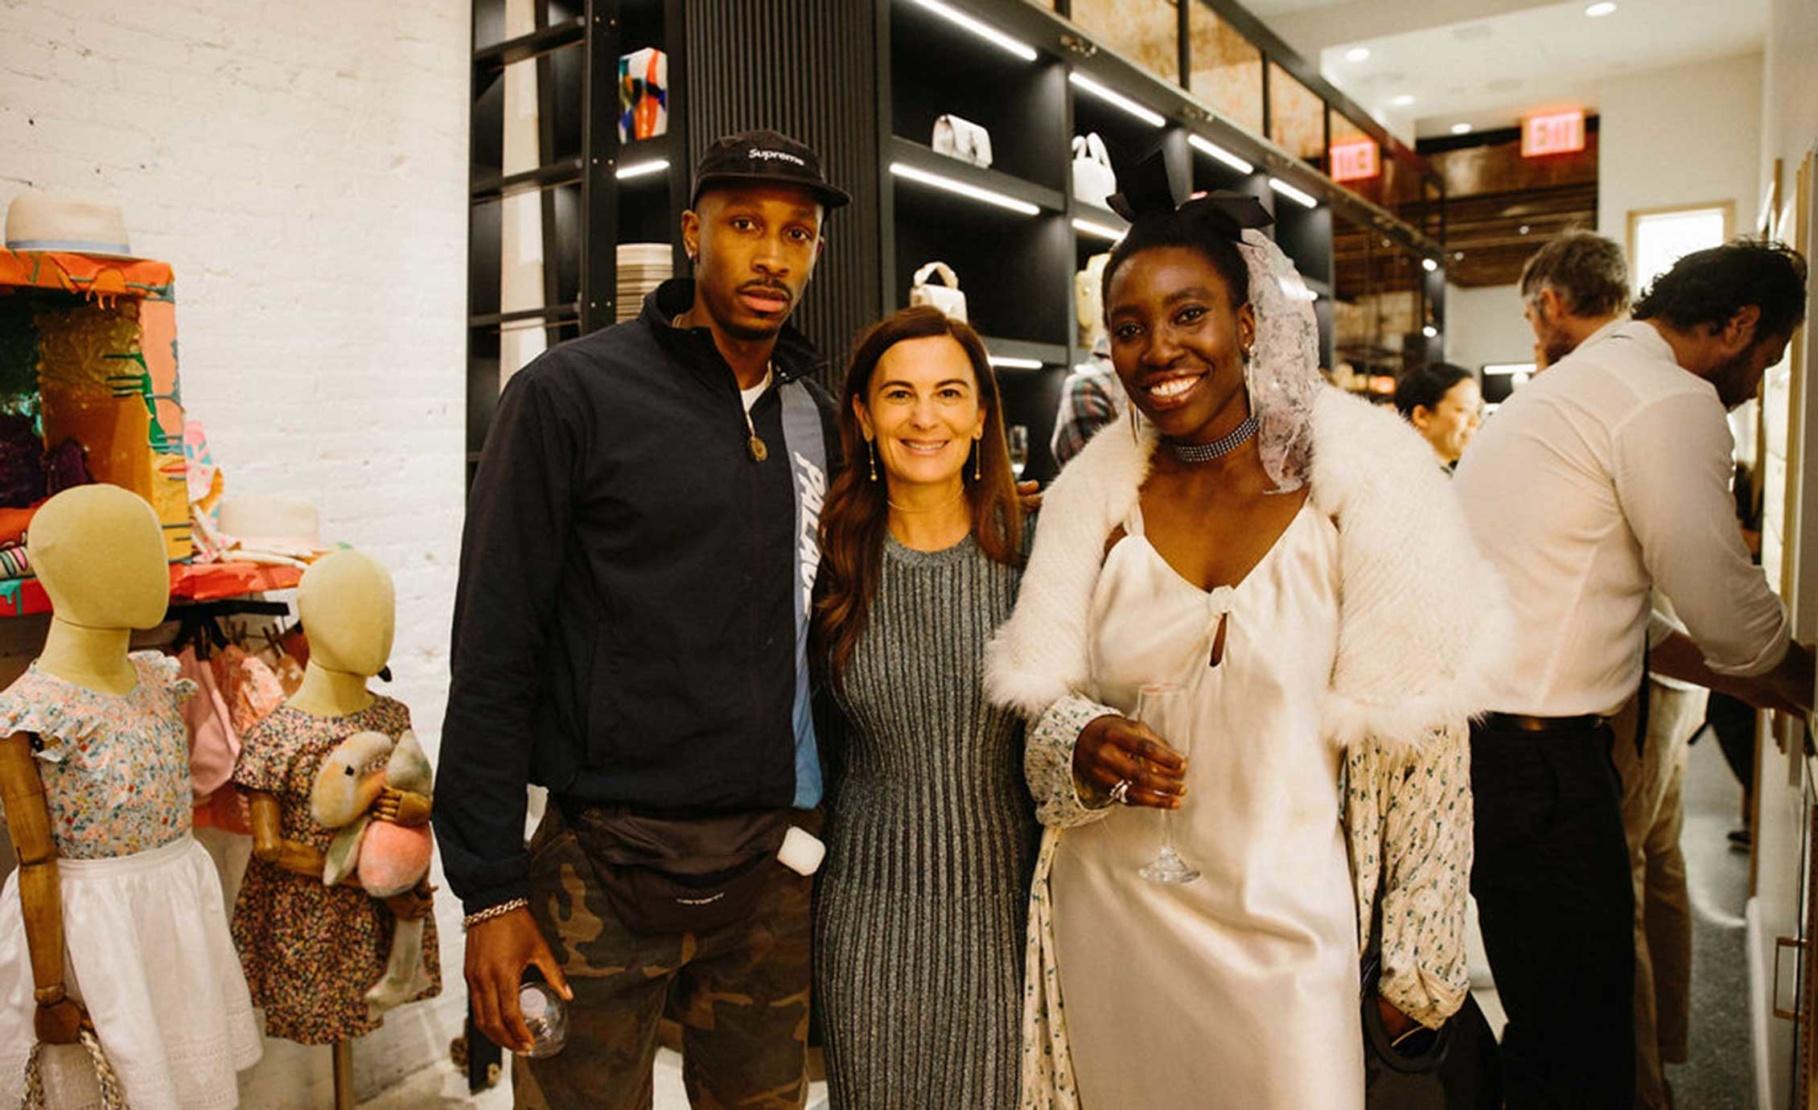 Philip-Daniel Ducasse, Sarah Harrelson and Becky Akinyode